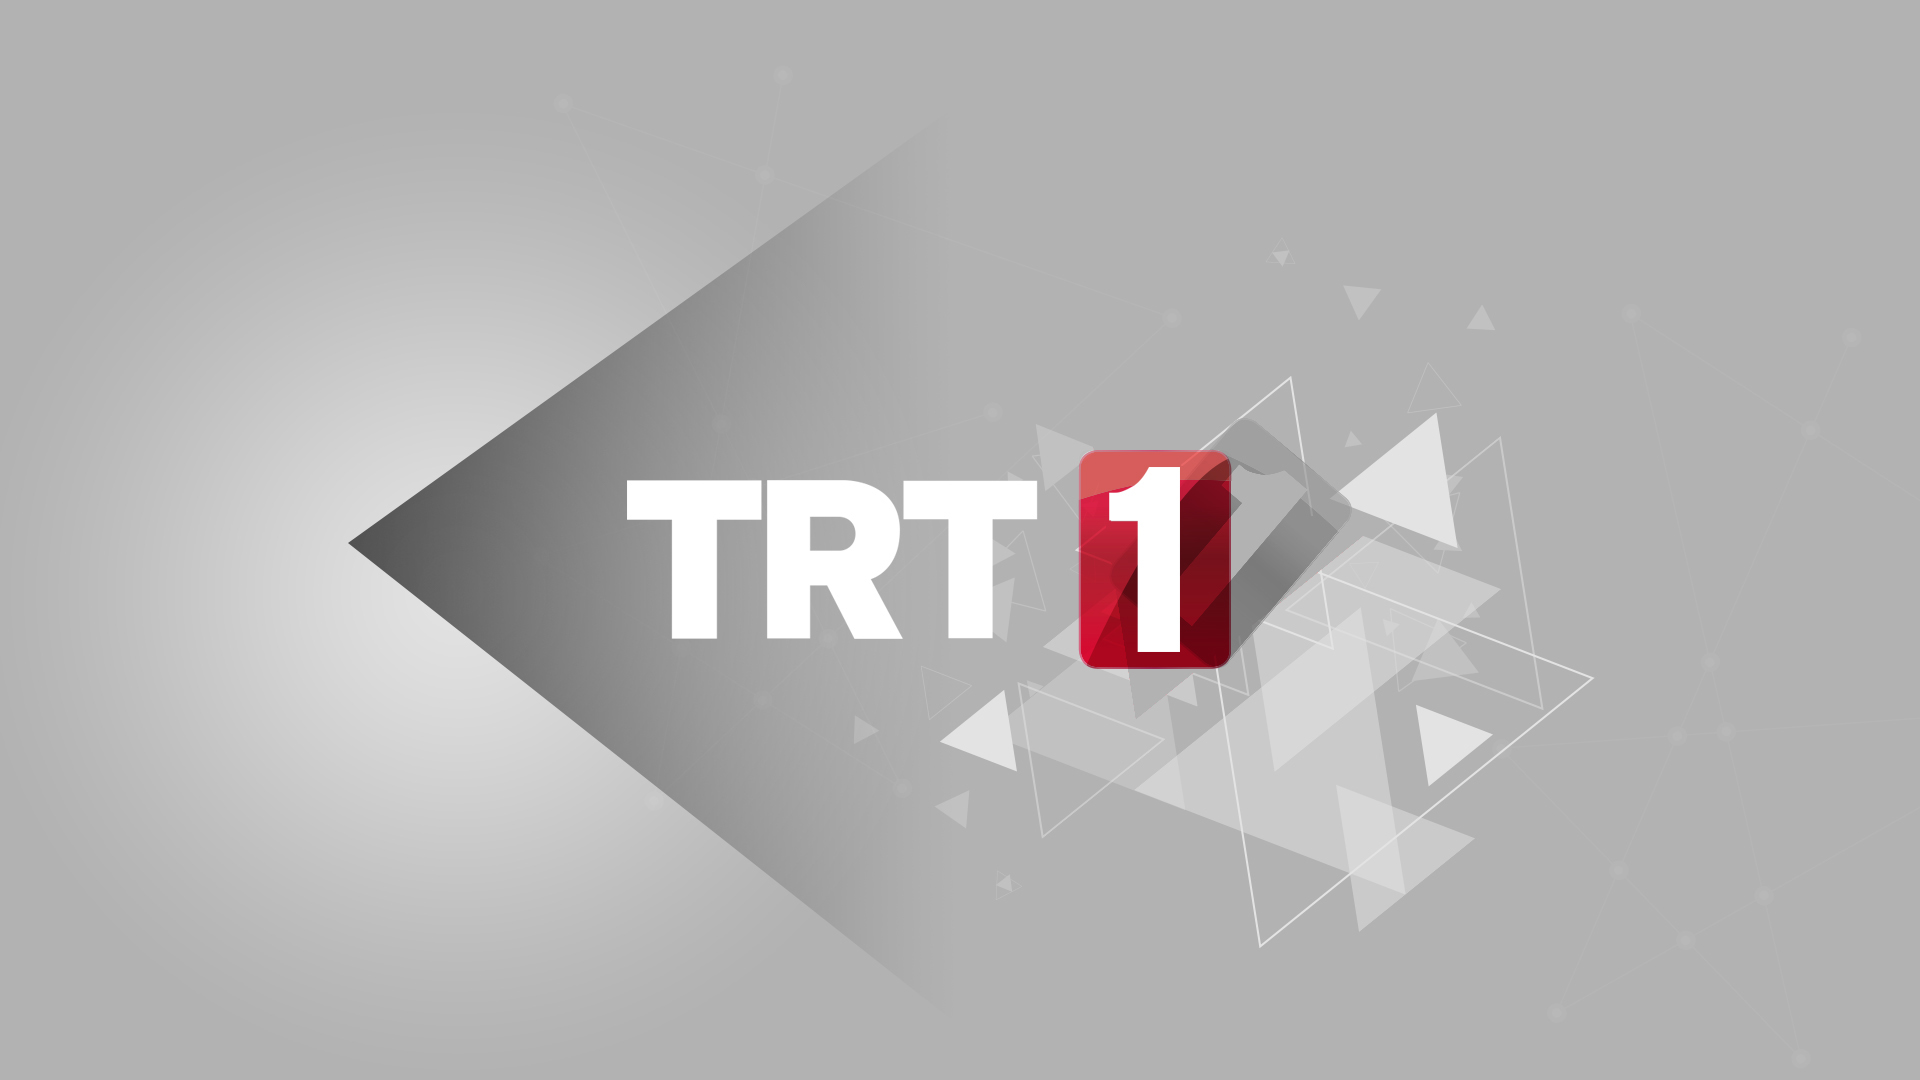 TRT+dizisinde+ba%C5%9Frol+oyuncusunun+koronavir%C3%BCs+testi+pozitif+%C3%A7ekti%21;